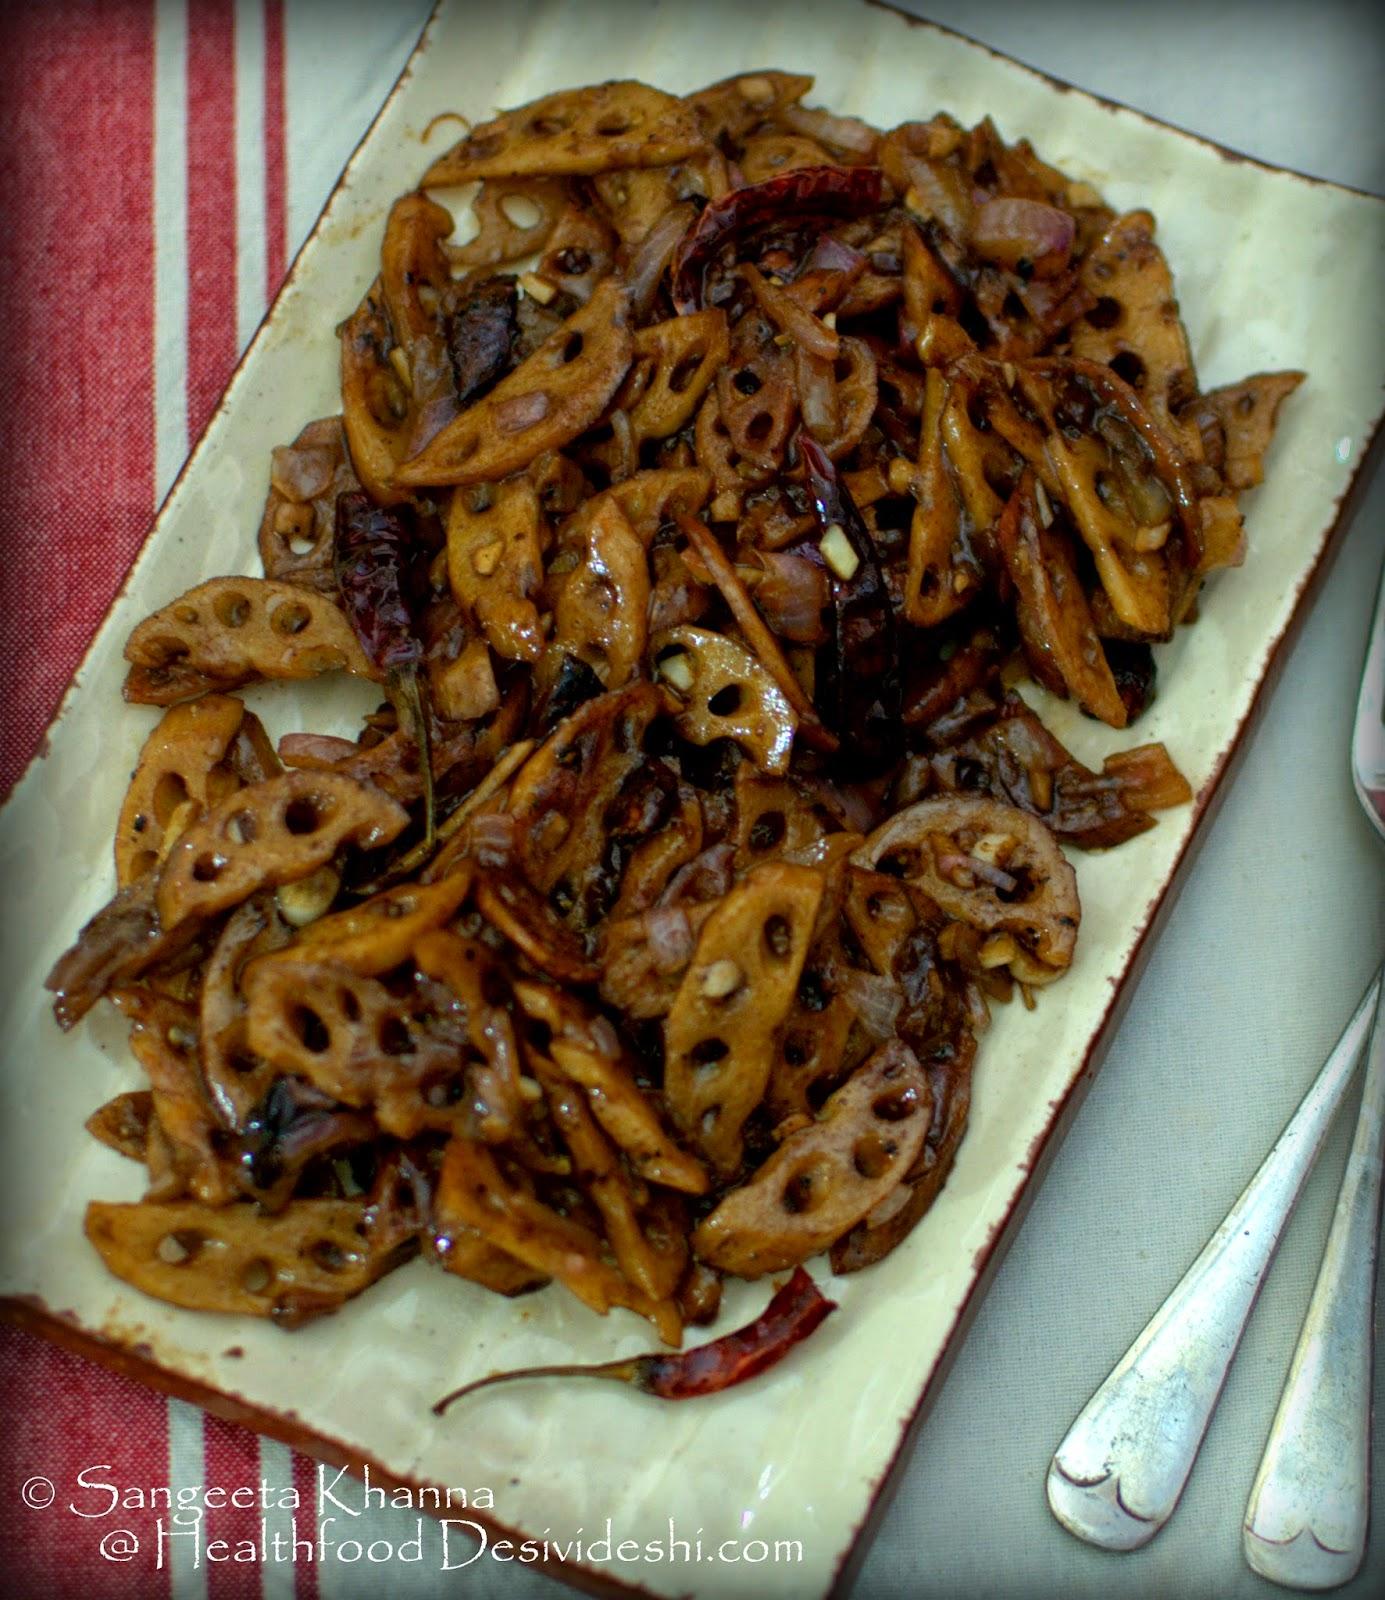 a warm Oriental salad with lotus stem | lotus stem stir fry salad with tamarind chilly sauce